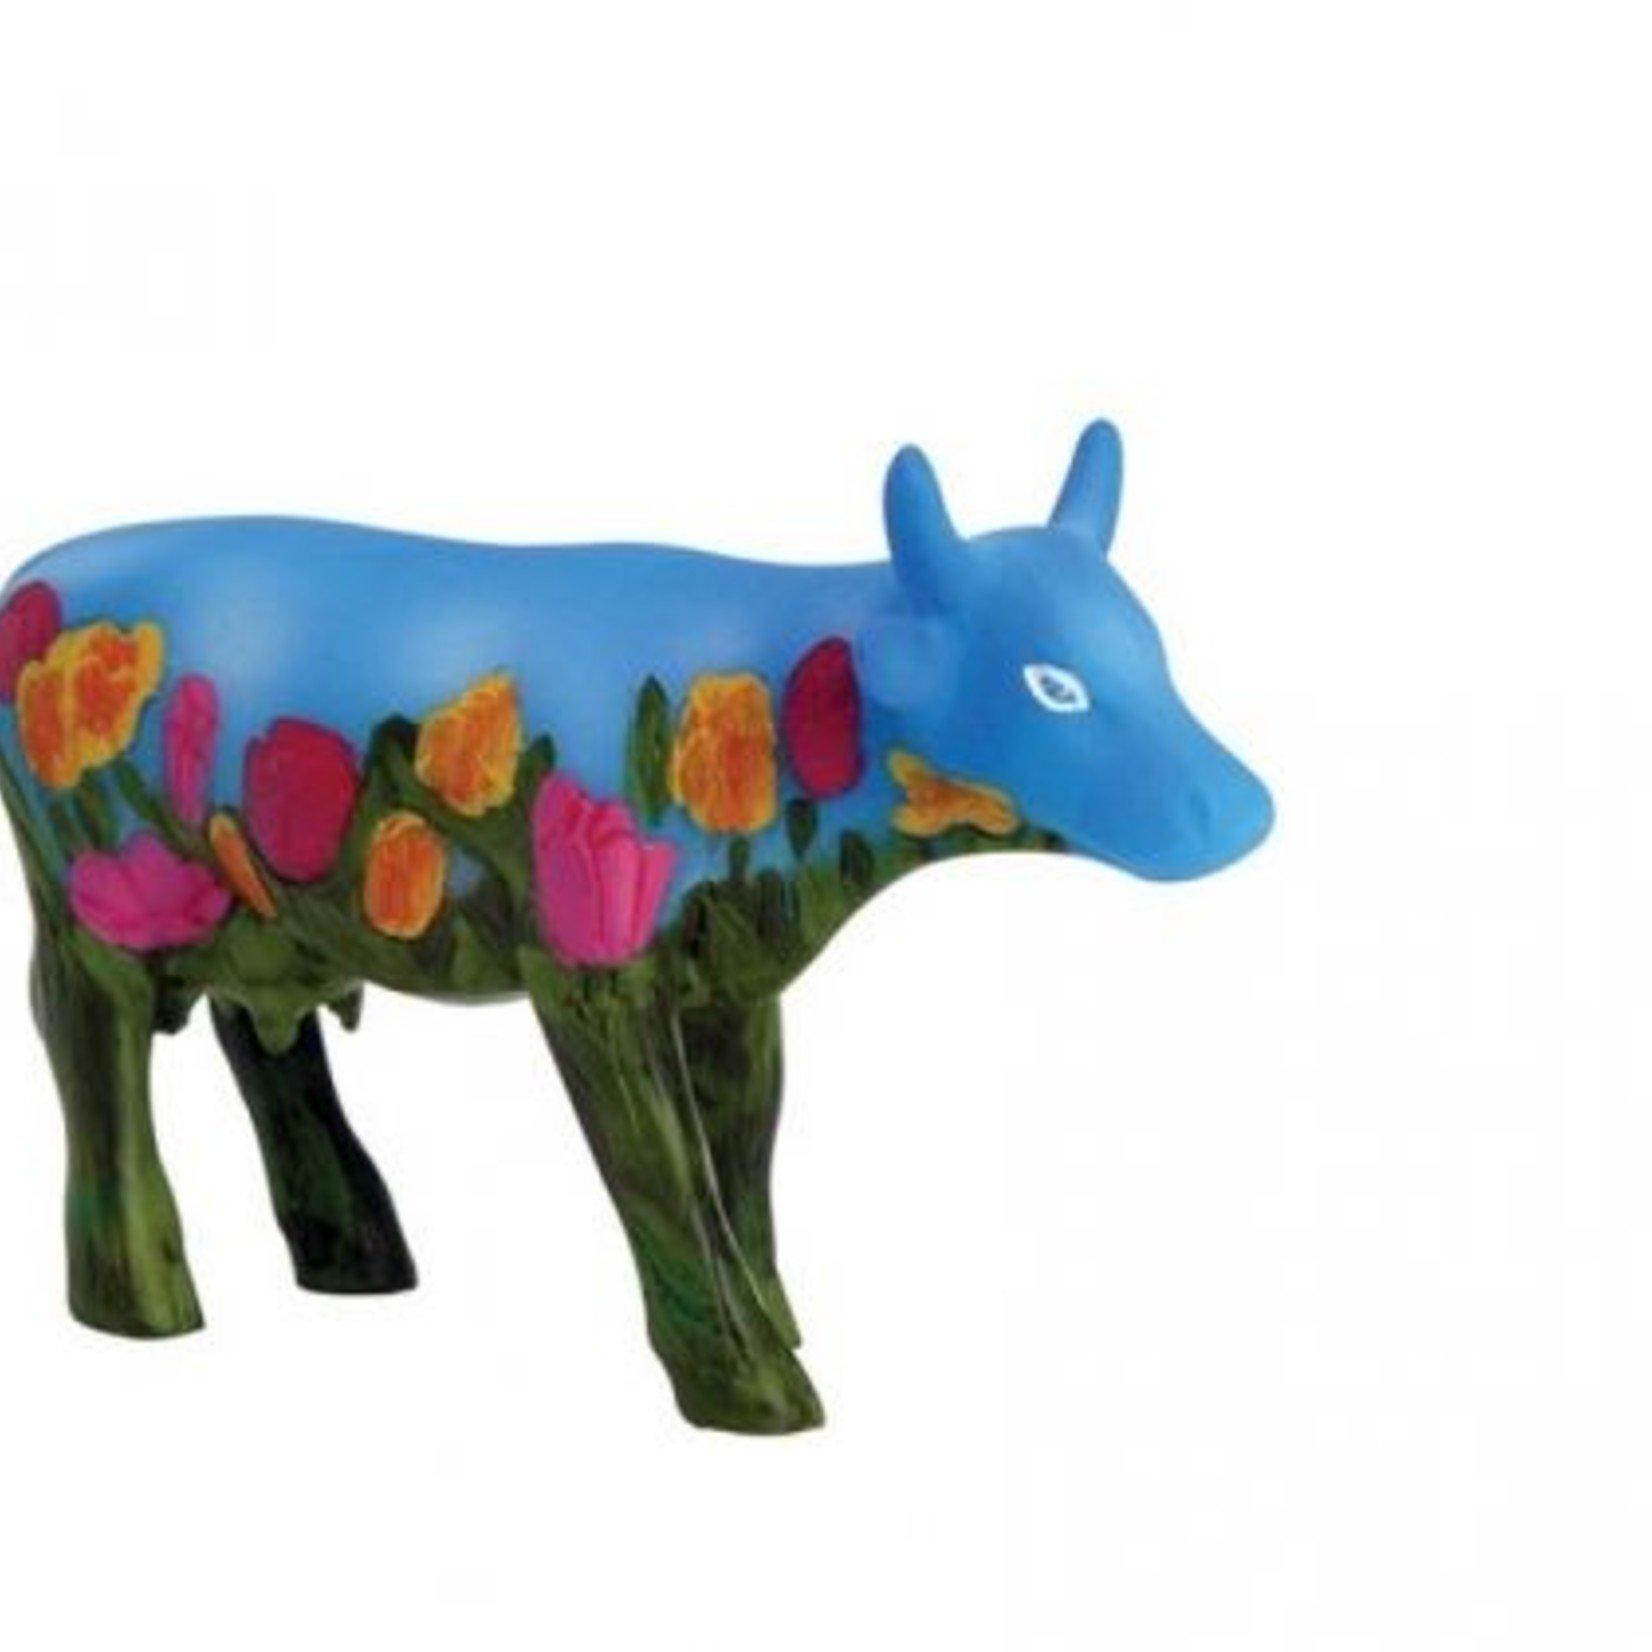 Cowparade Cowparade Small Netherlands